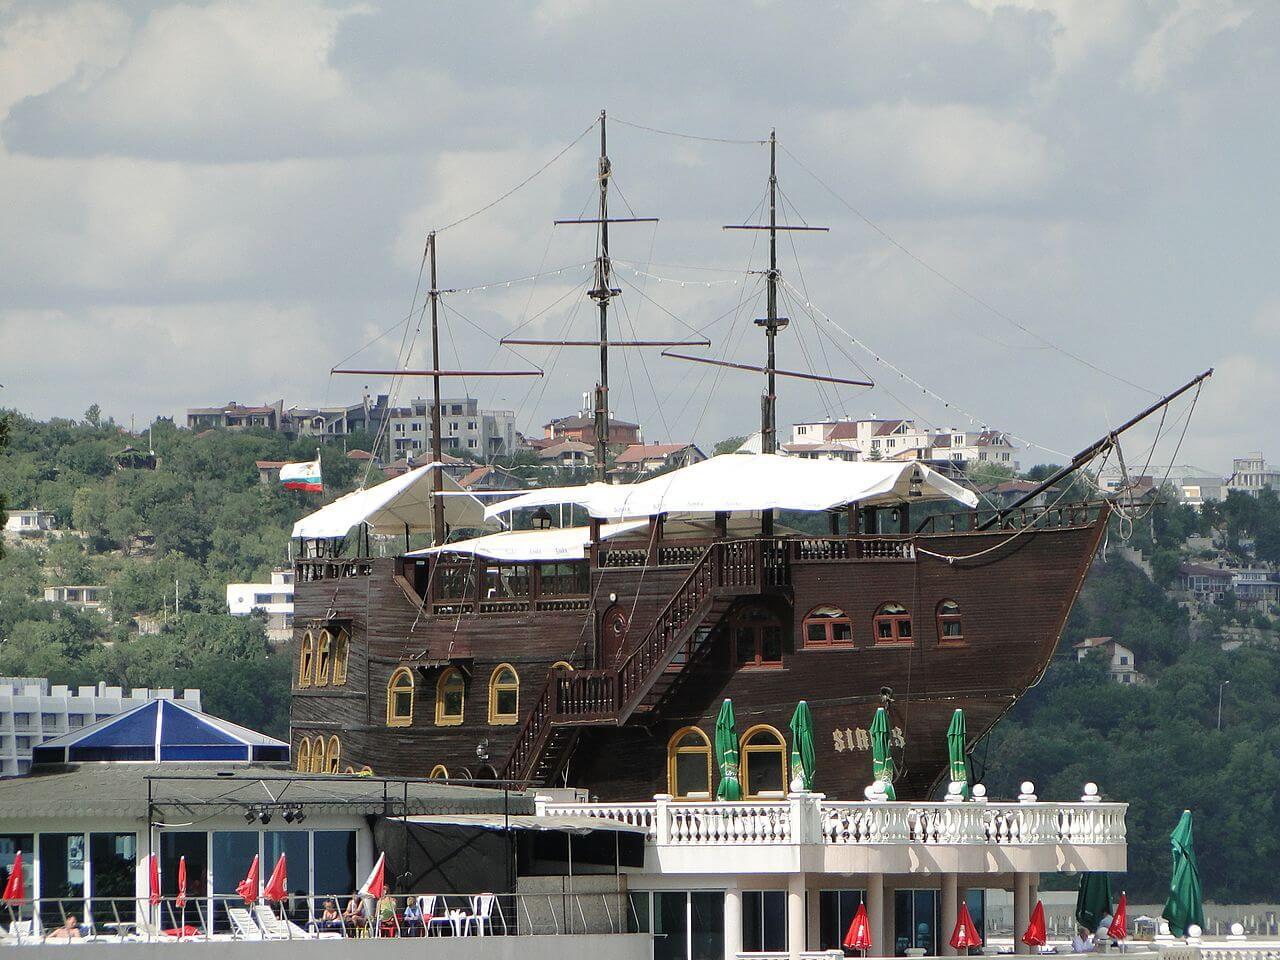 Sirius hajóétterem